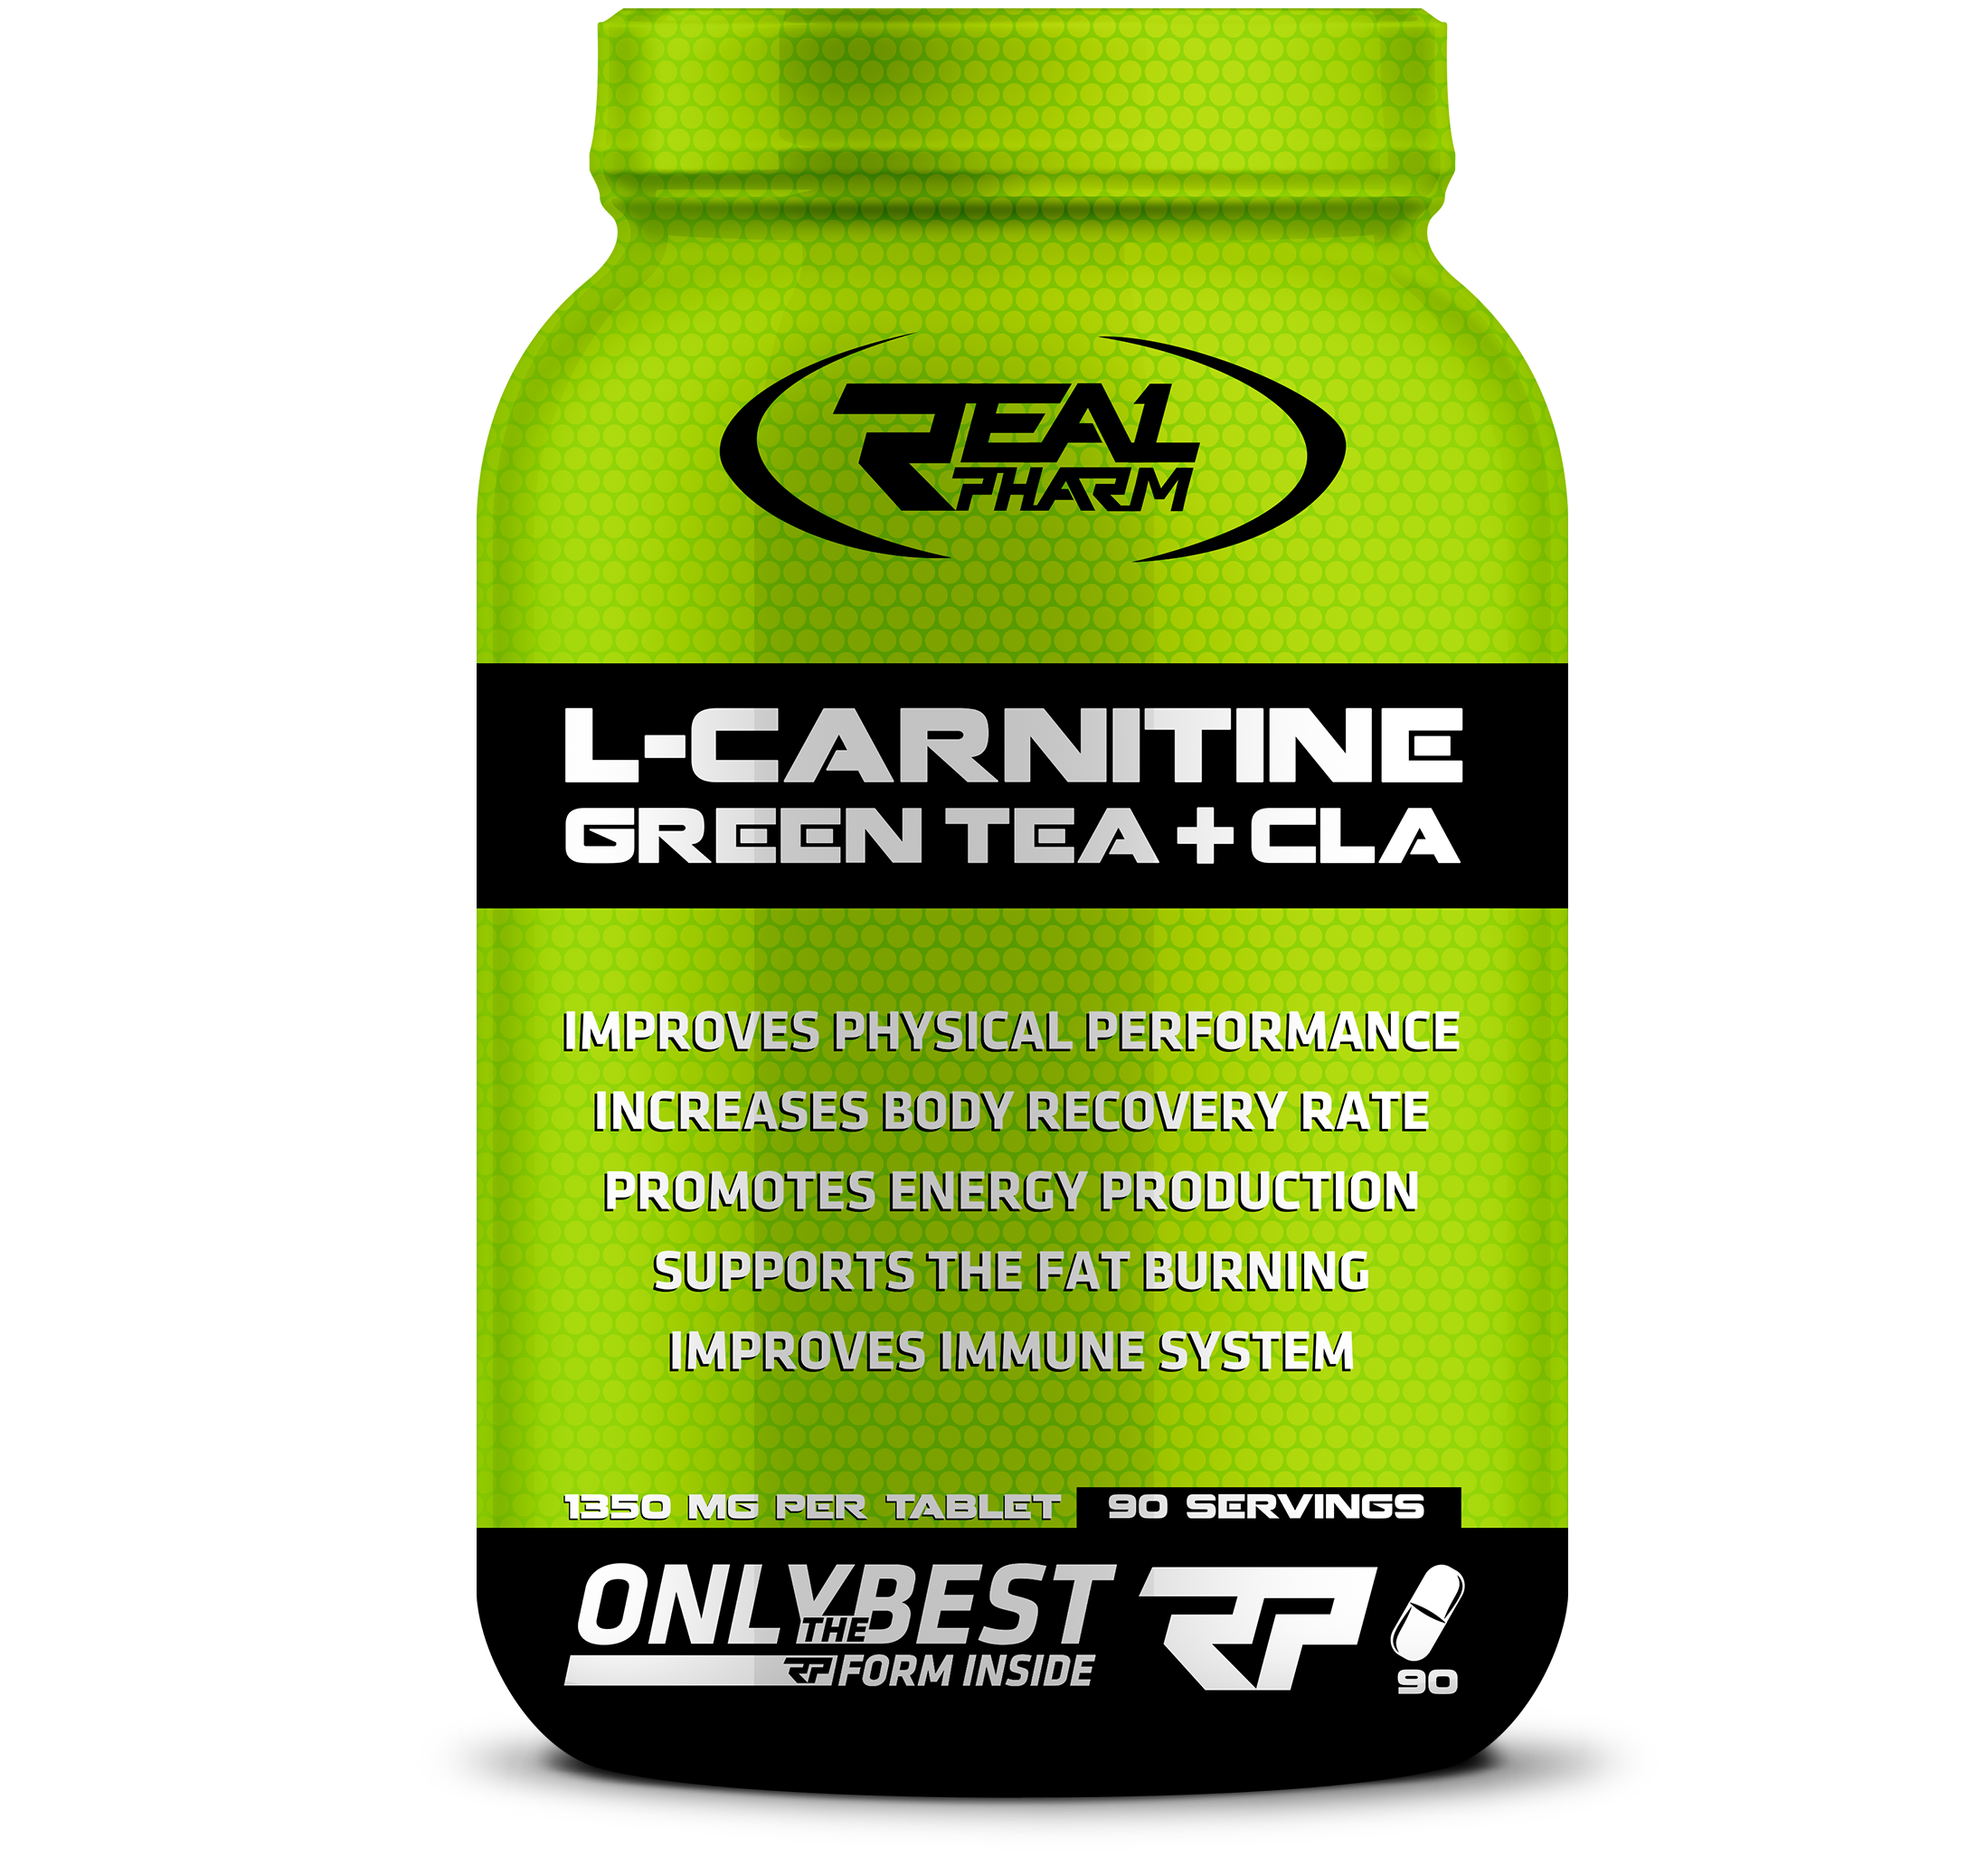 Real Pharm L-Carnitine, Green Tea & CLA - Malta Supplement